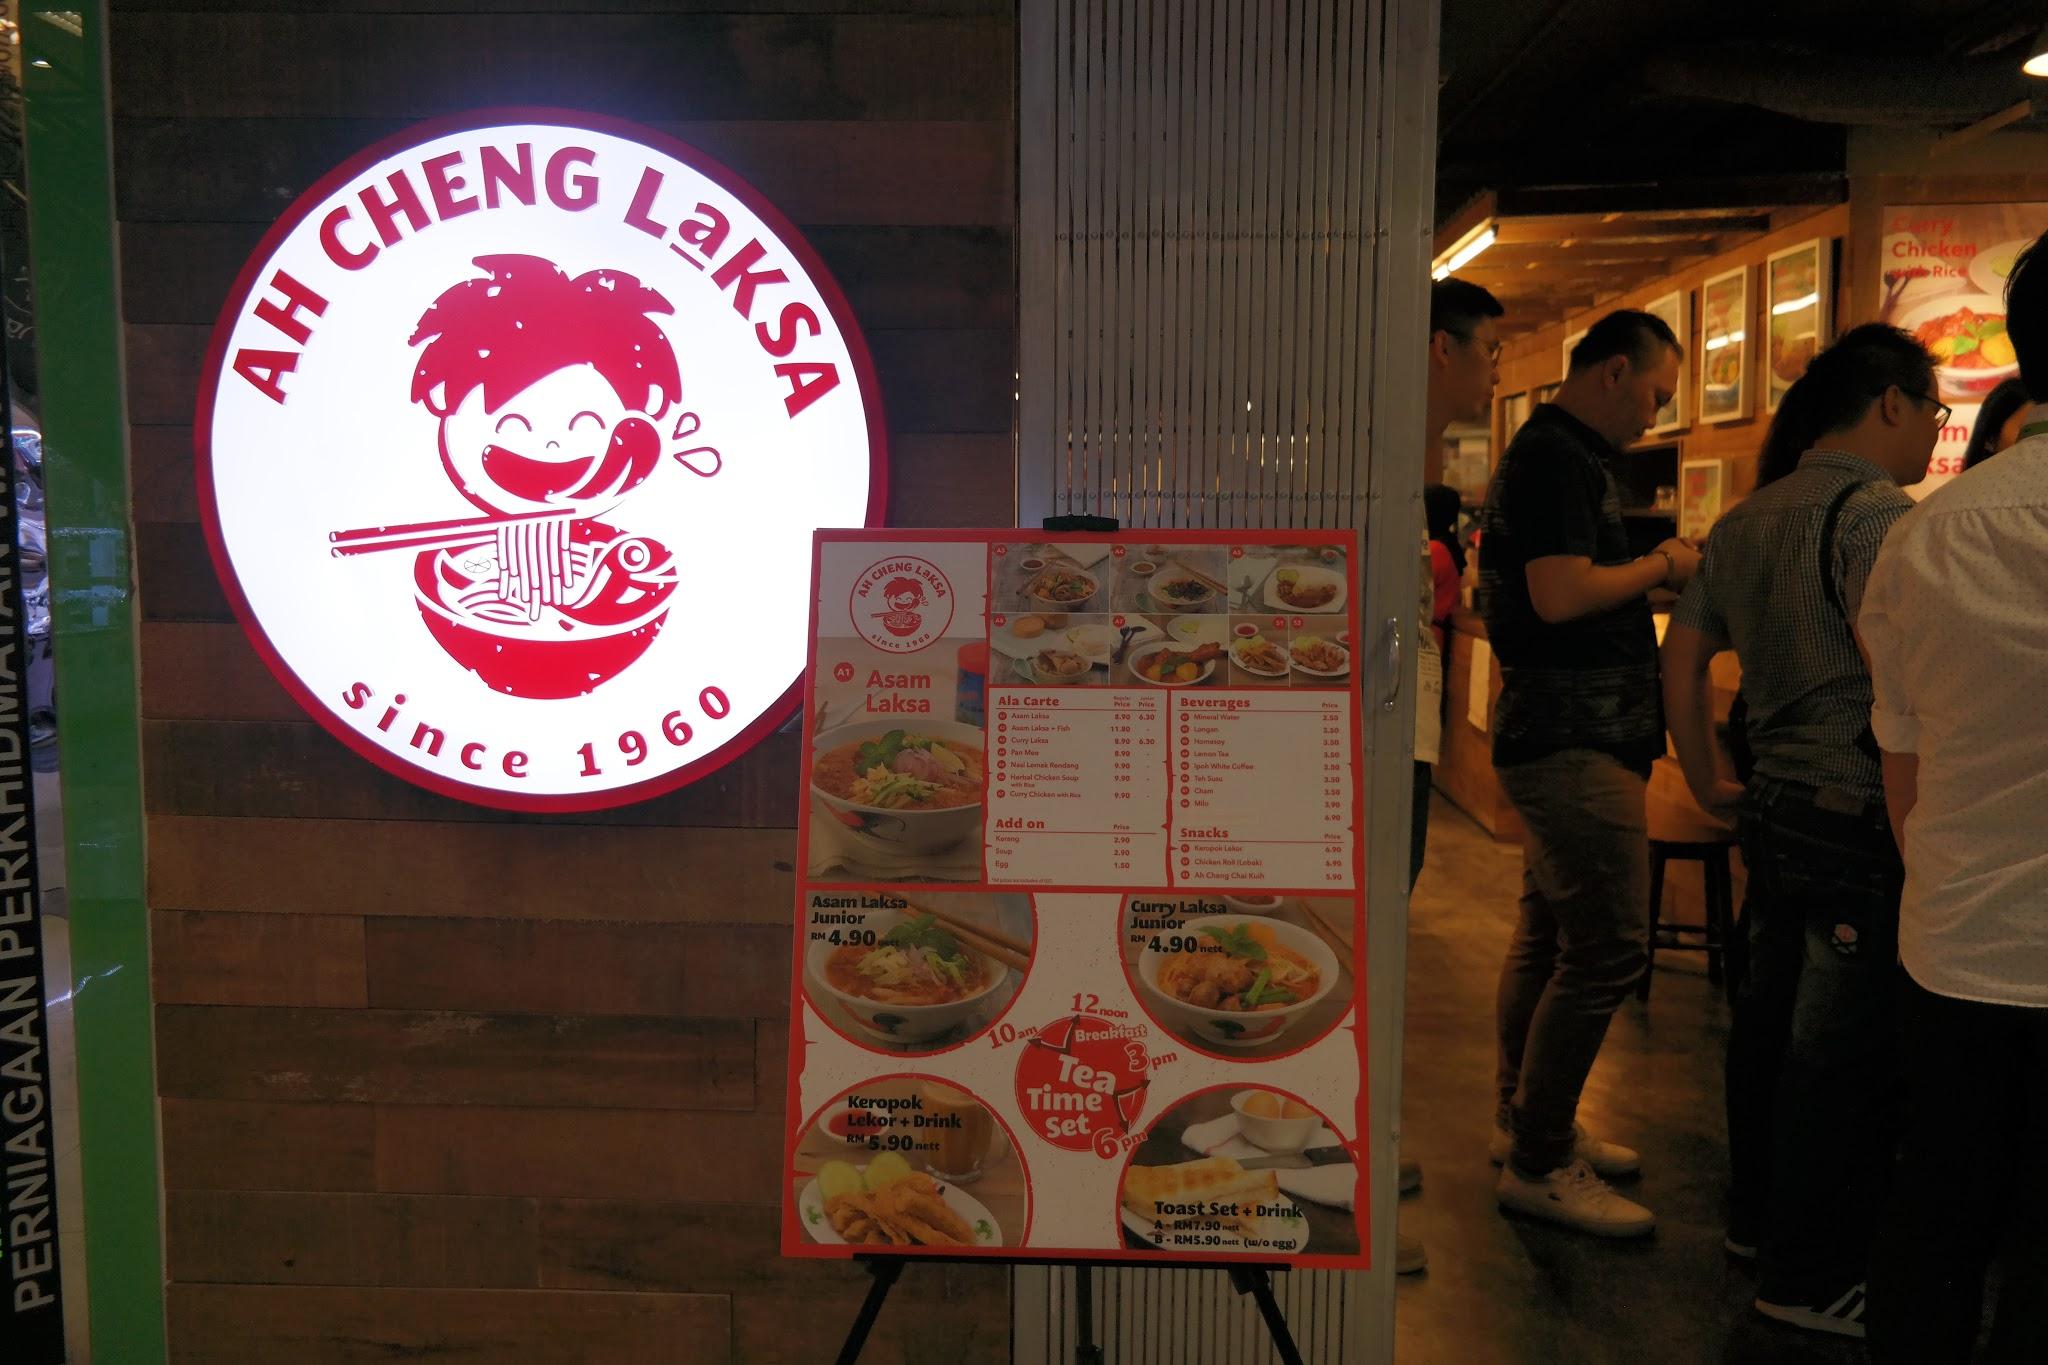 Ah Cheng Laksa,